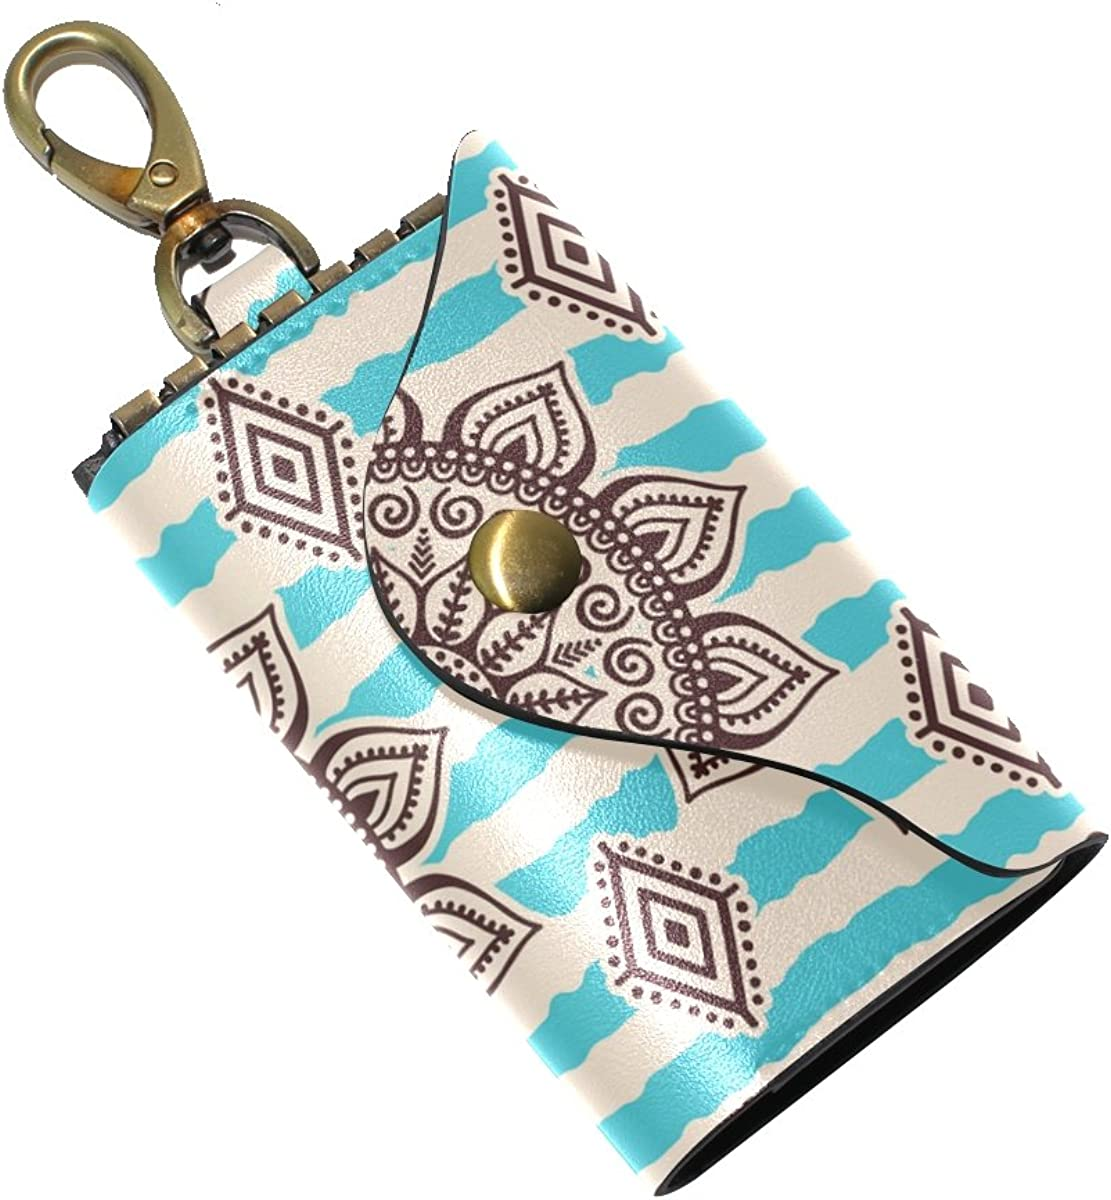 KEAKIA Ethic Tribal Pattern Leather Key Case Wallets Tri-fold Key Holder Keychains with 6 Hooks 2 Slot Snap Closure for Men Women